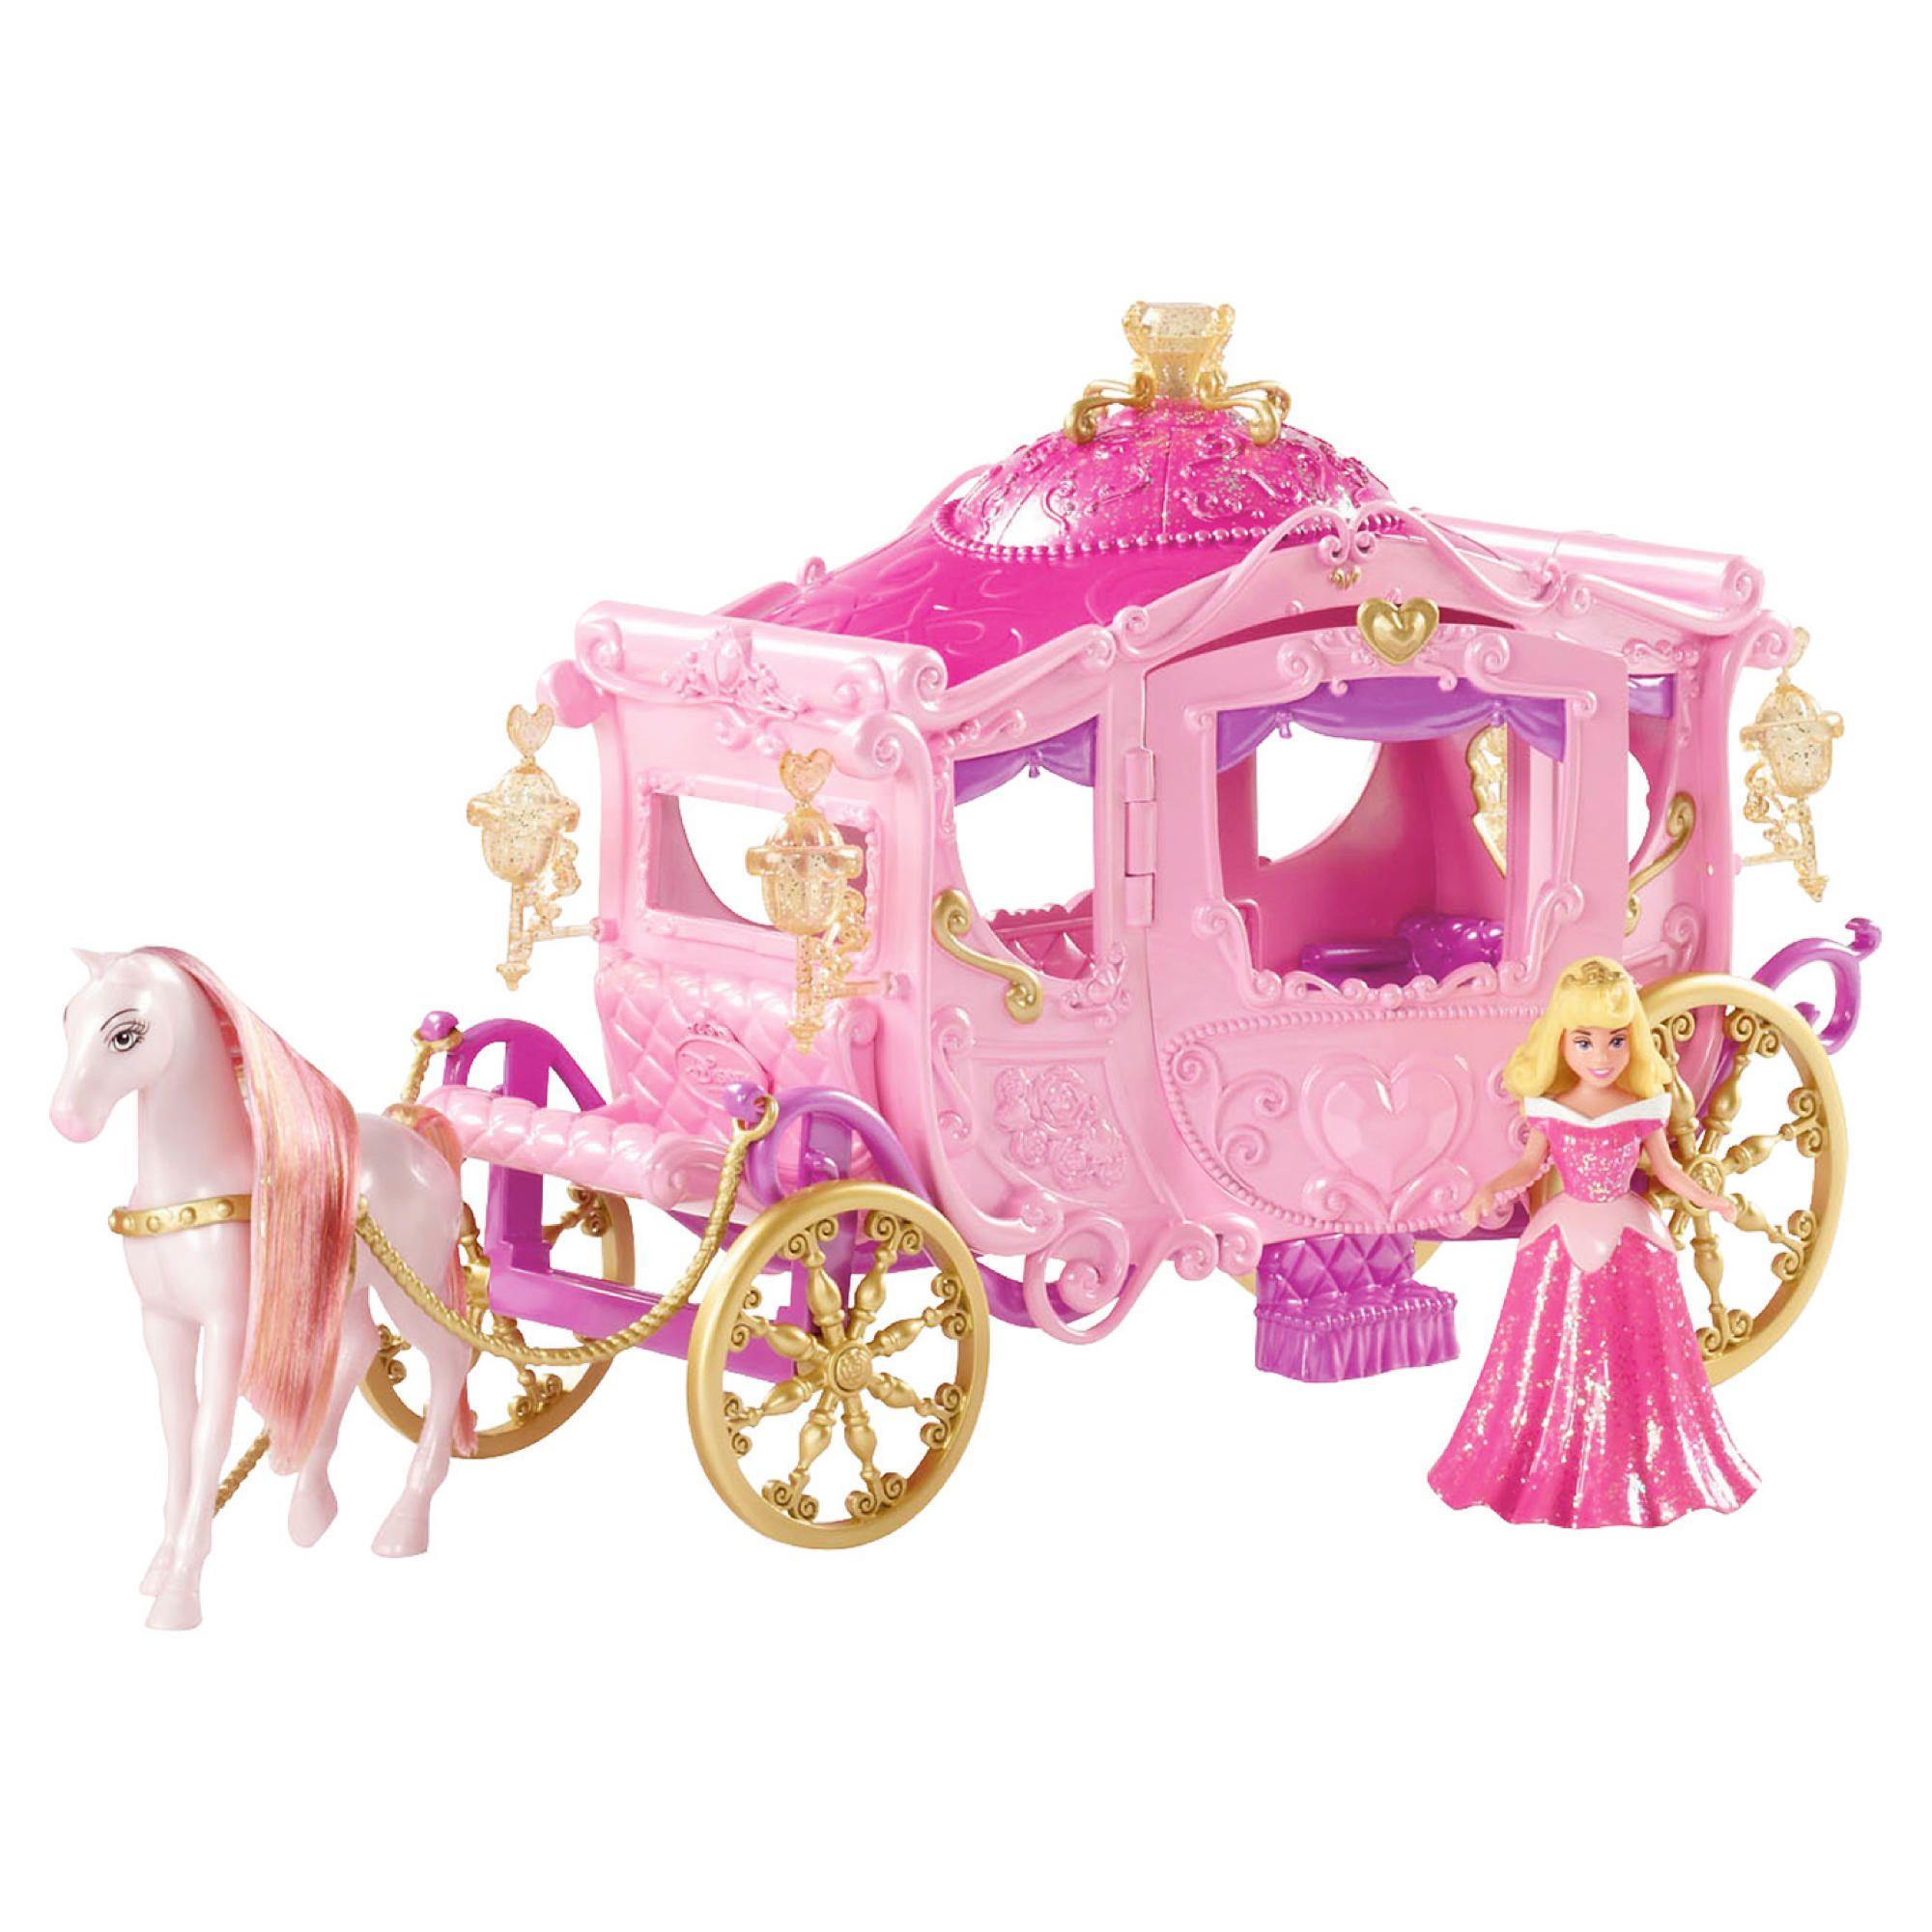 Disney Princess Little Kingdom Magiclip Sleeping Beauty: Myshop